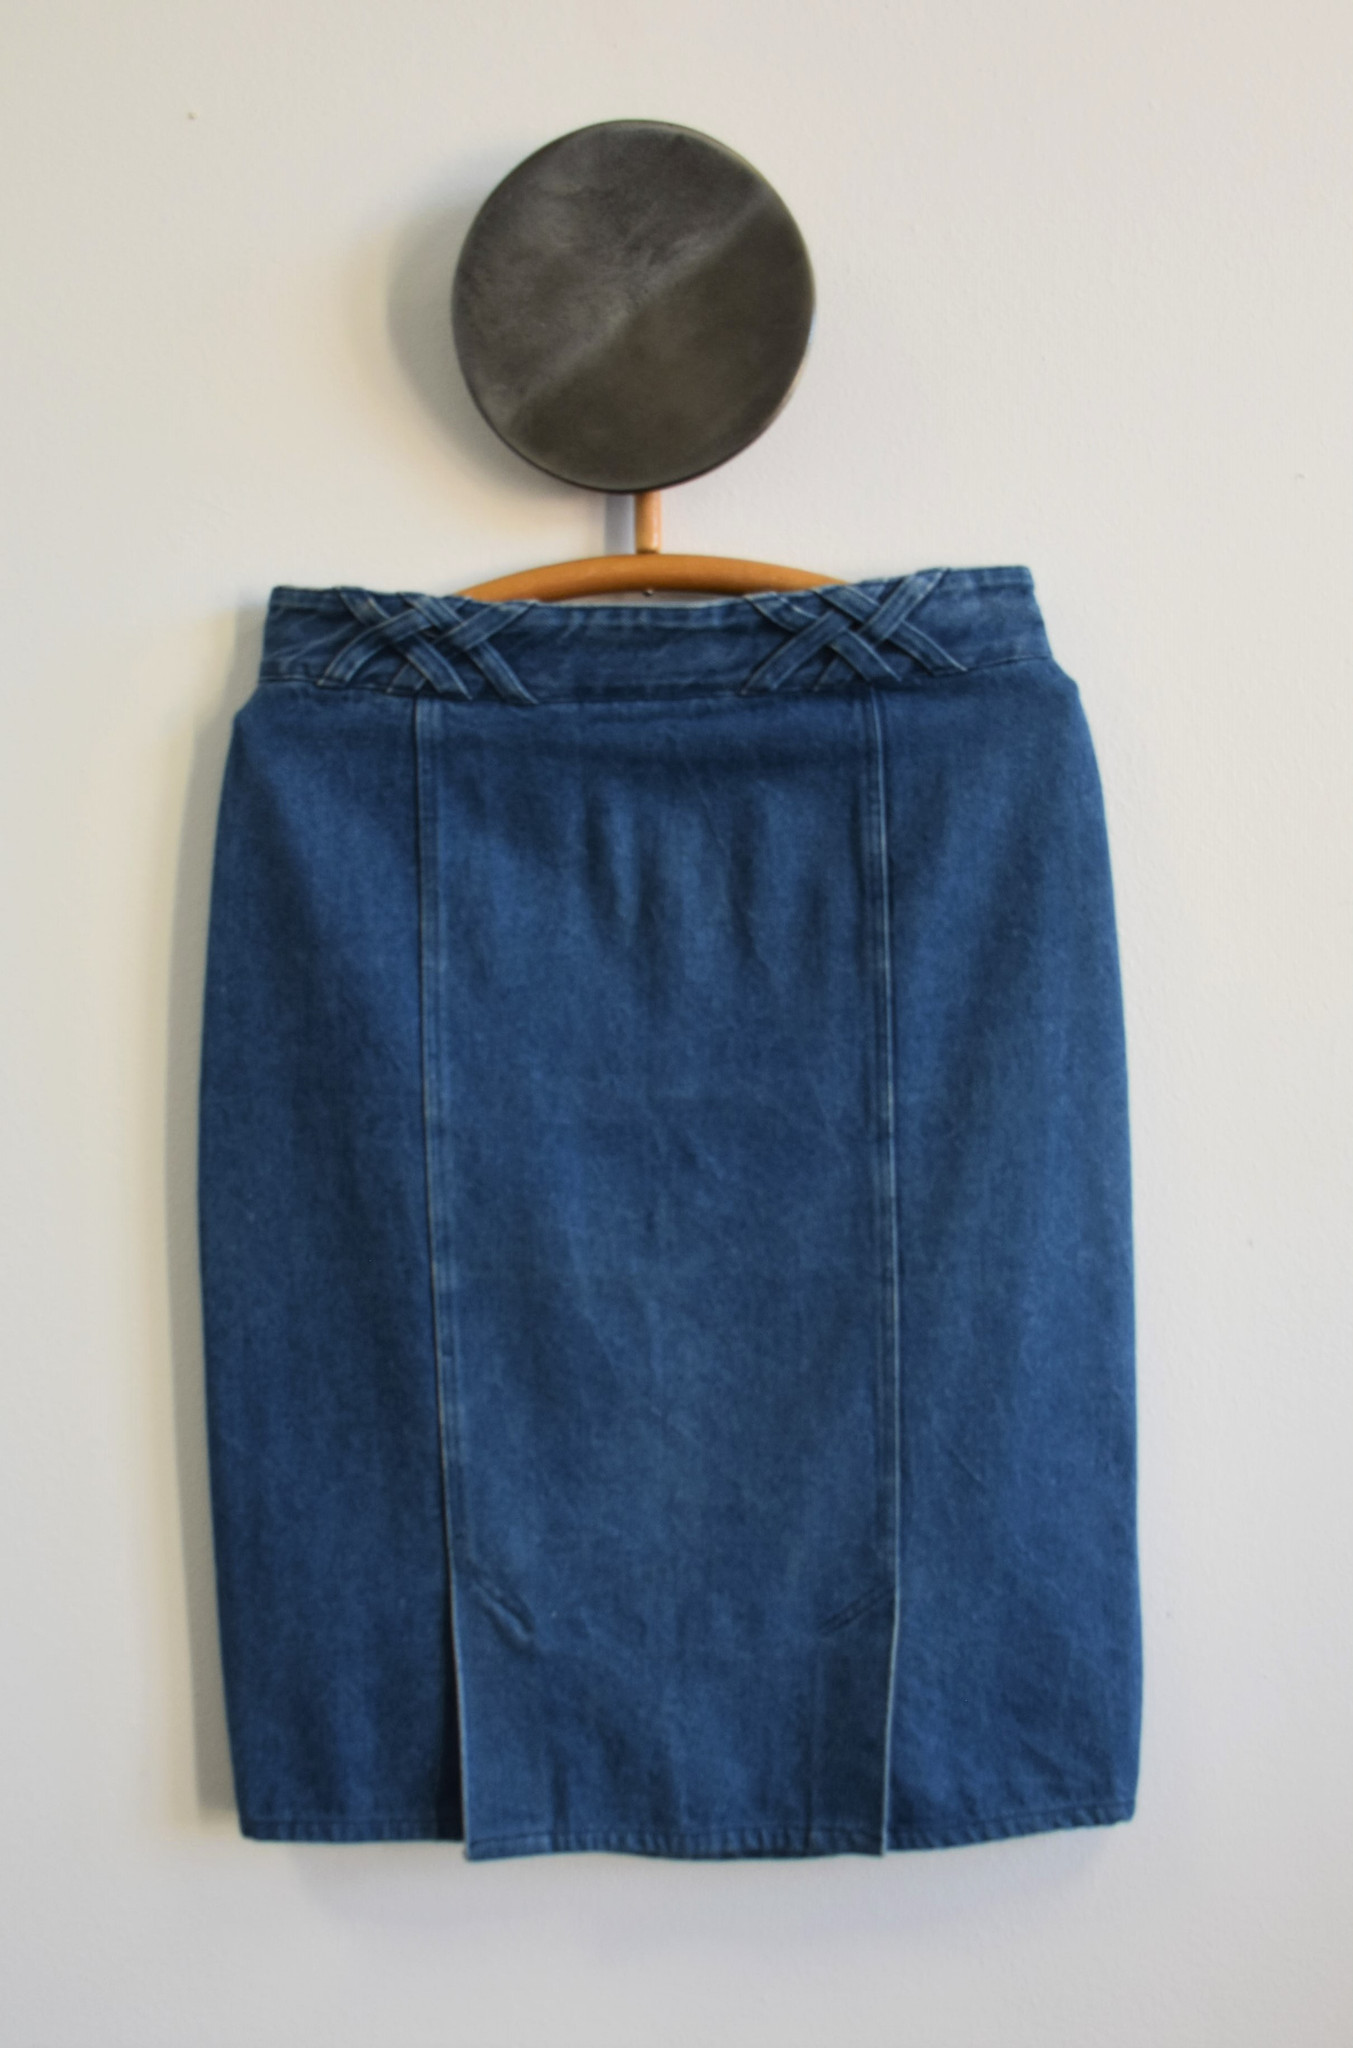 Ołówkowa spódnica jeansowa z ozdobym pasem - PONOŚ SE vintage shop | JestemSlow.pl